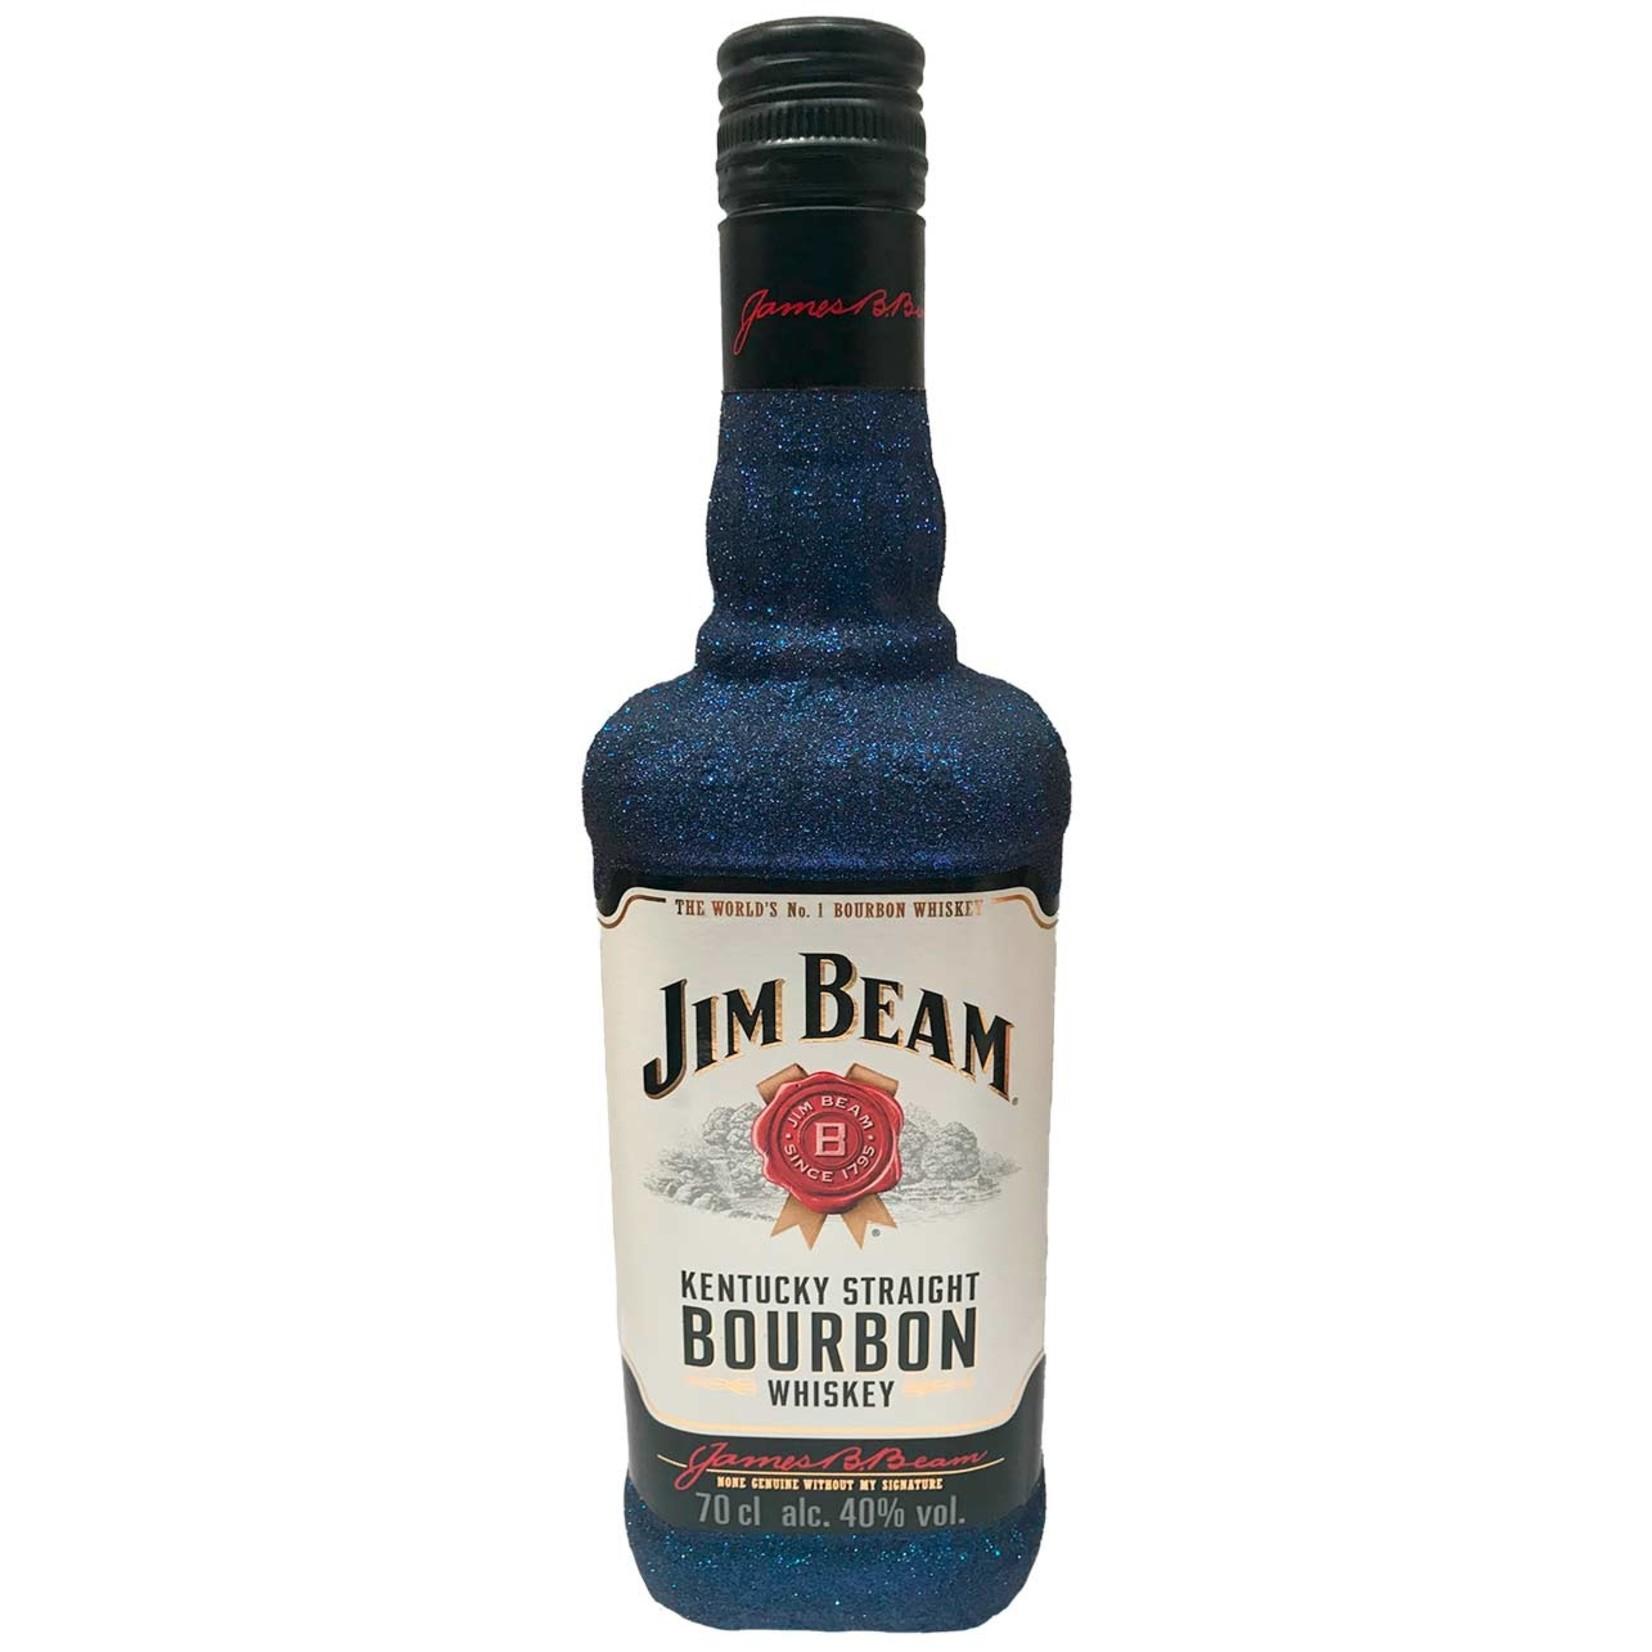 Whisky Glitzer  Jim Beam Kentucky Straight Bourbon (0,7l)